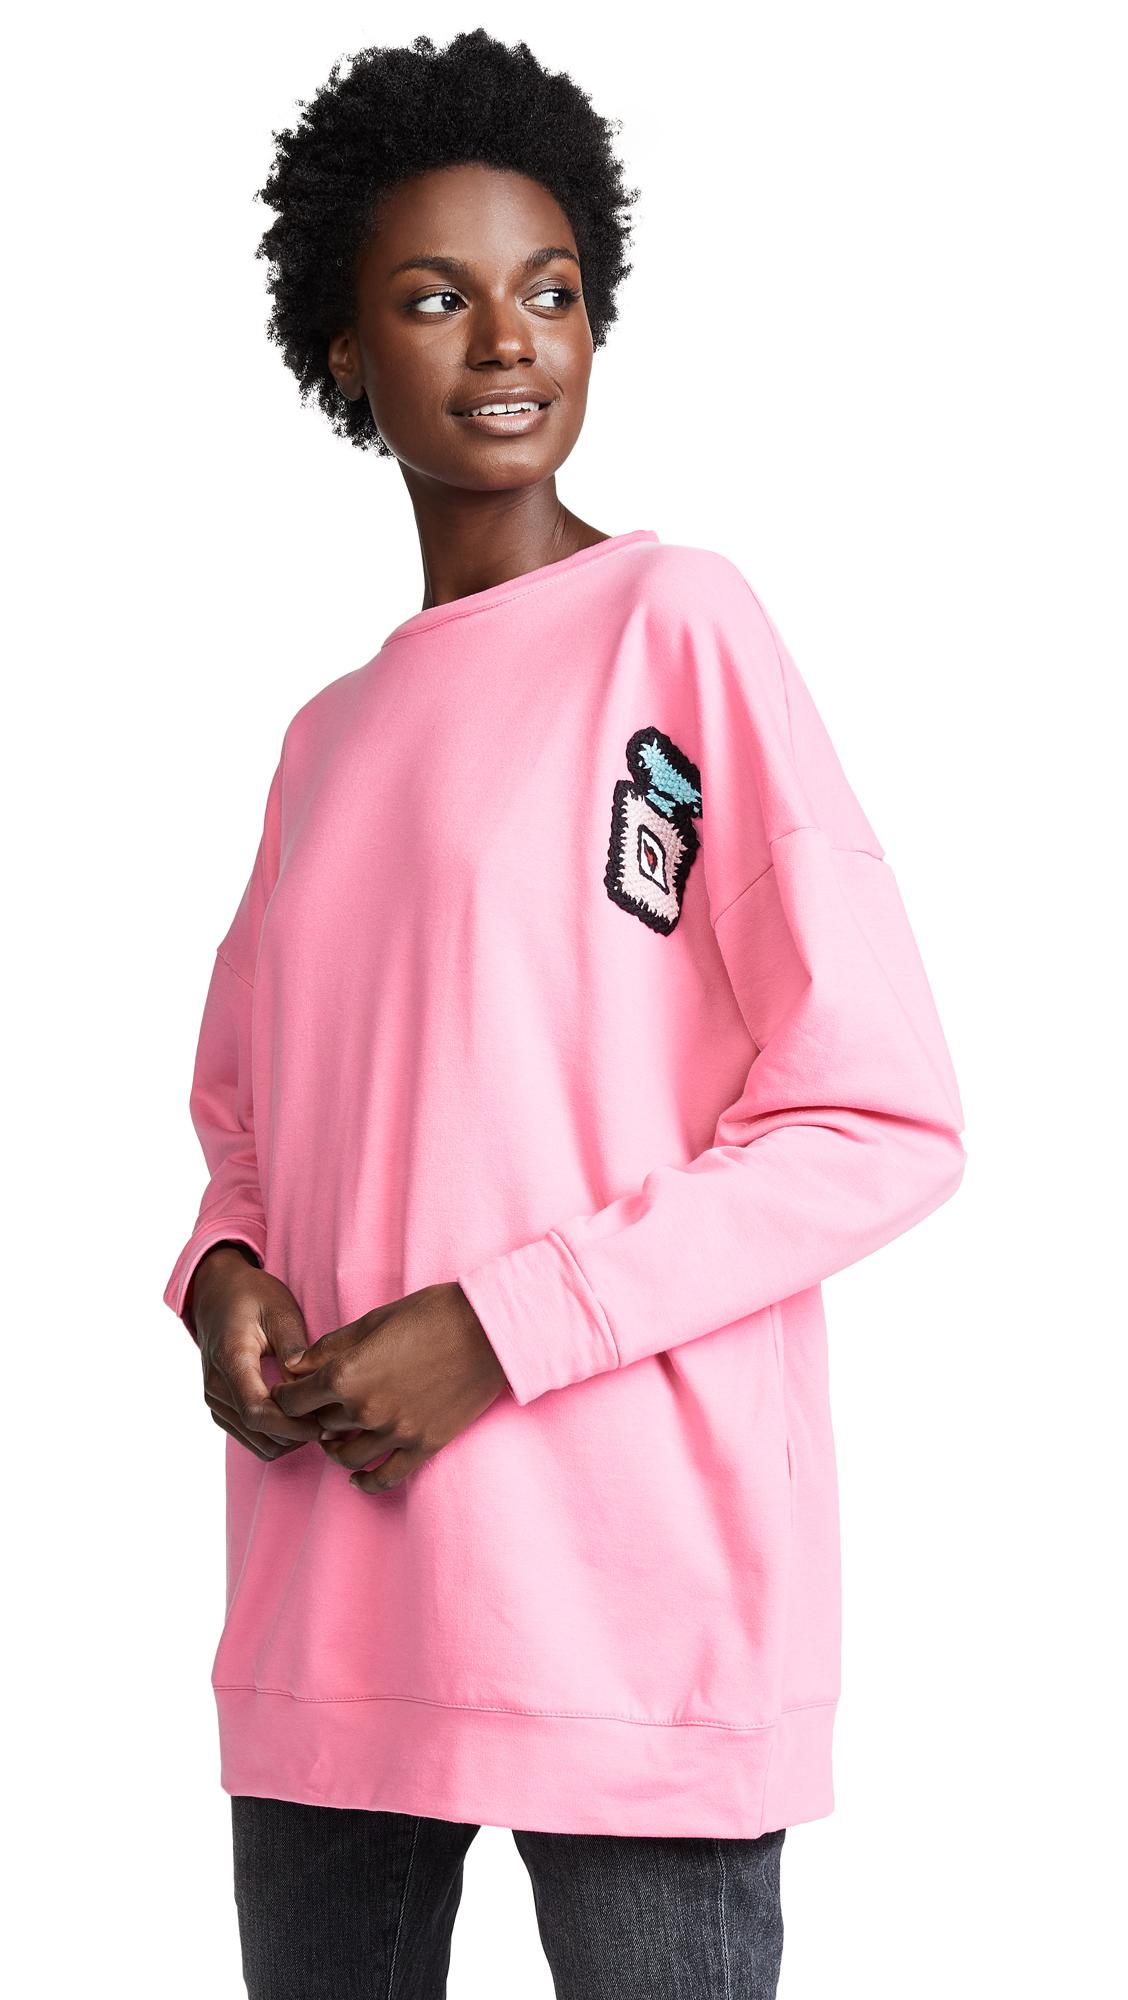 MICHAELA BUERGER Oversize Perfume Bottle Sweatshirt in Pink